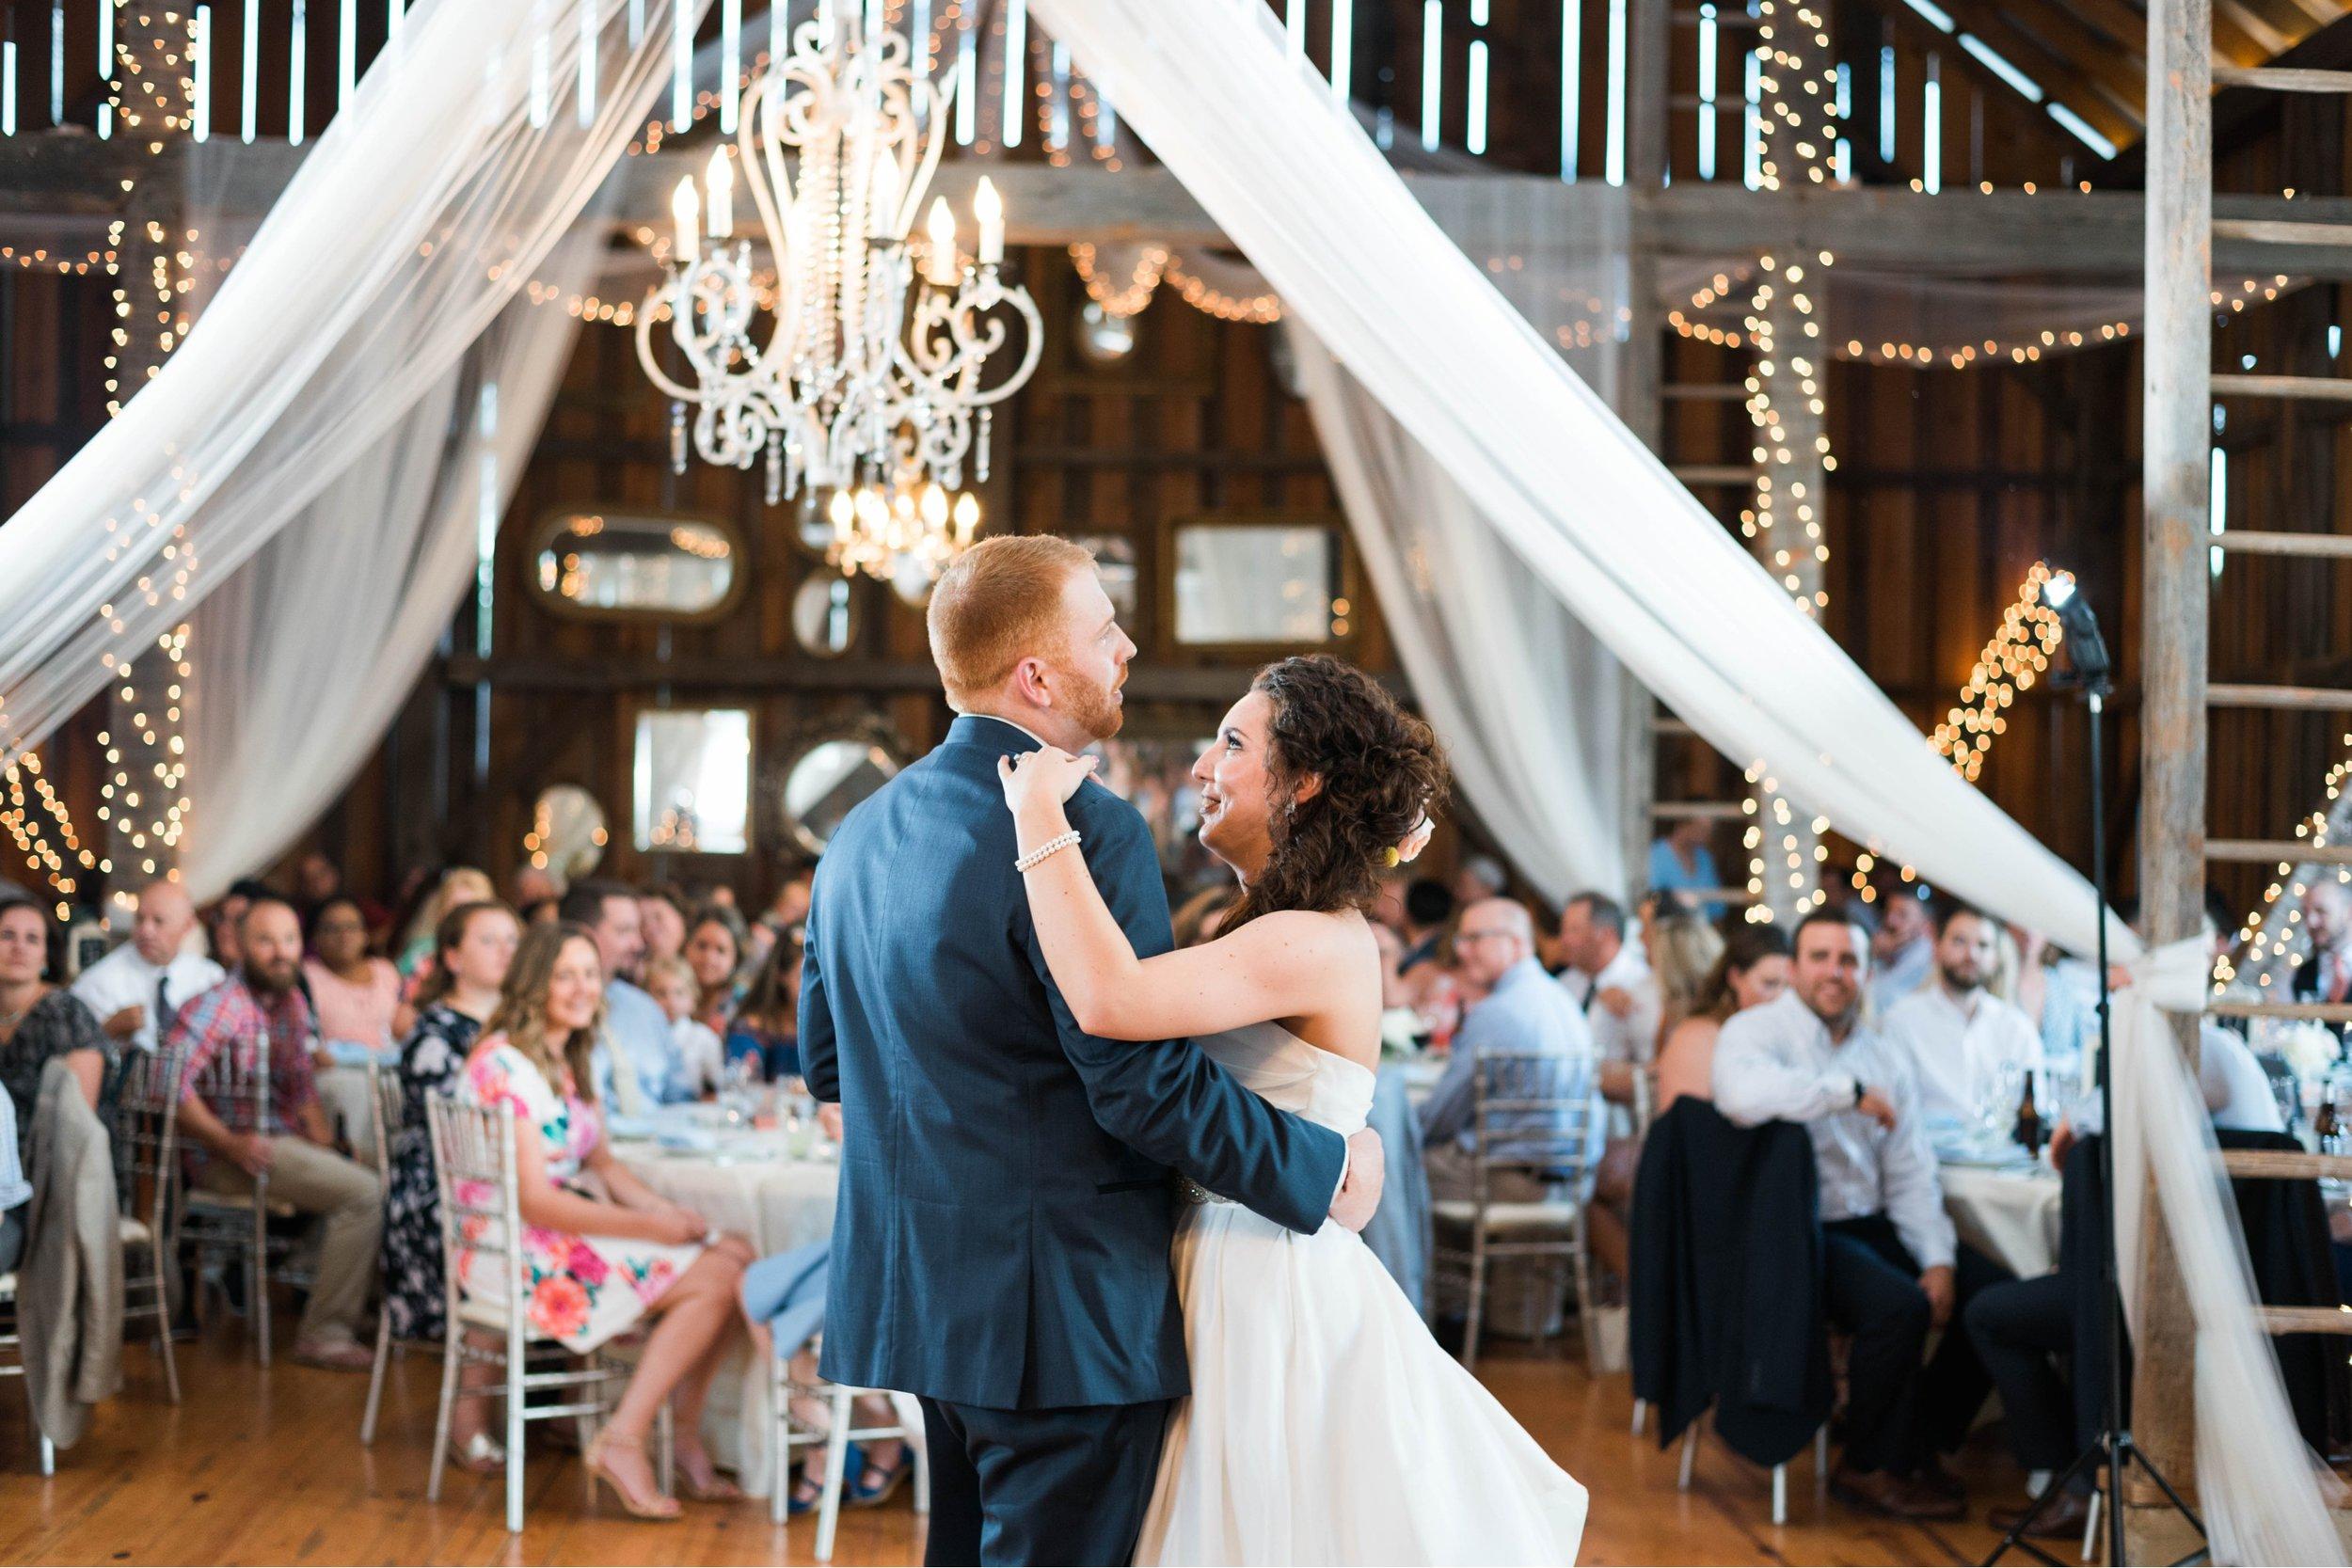 SorellaFarms_EvingtonVA_Lynchburgweddingphotographer_VirginiaweddingPhotographer_AshleyAndrewSorellaFarmsWedding 34.jpg